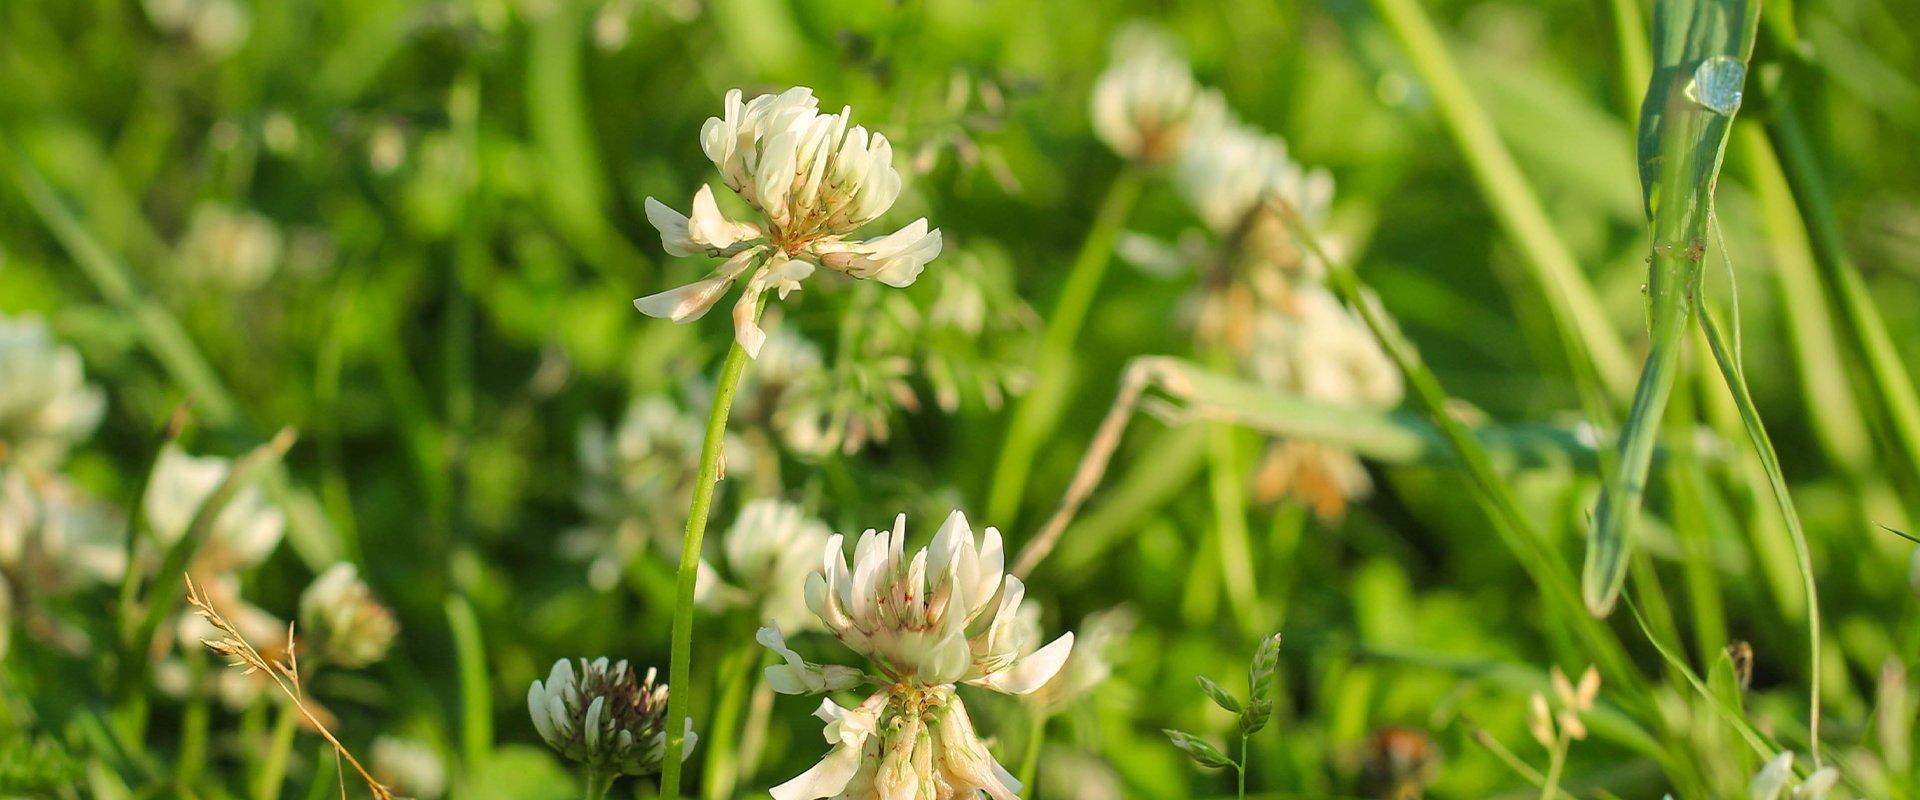 wild flowers in a feild